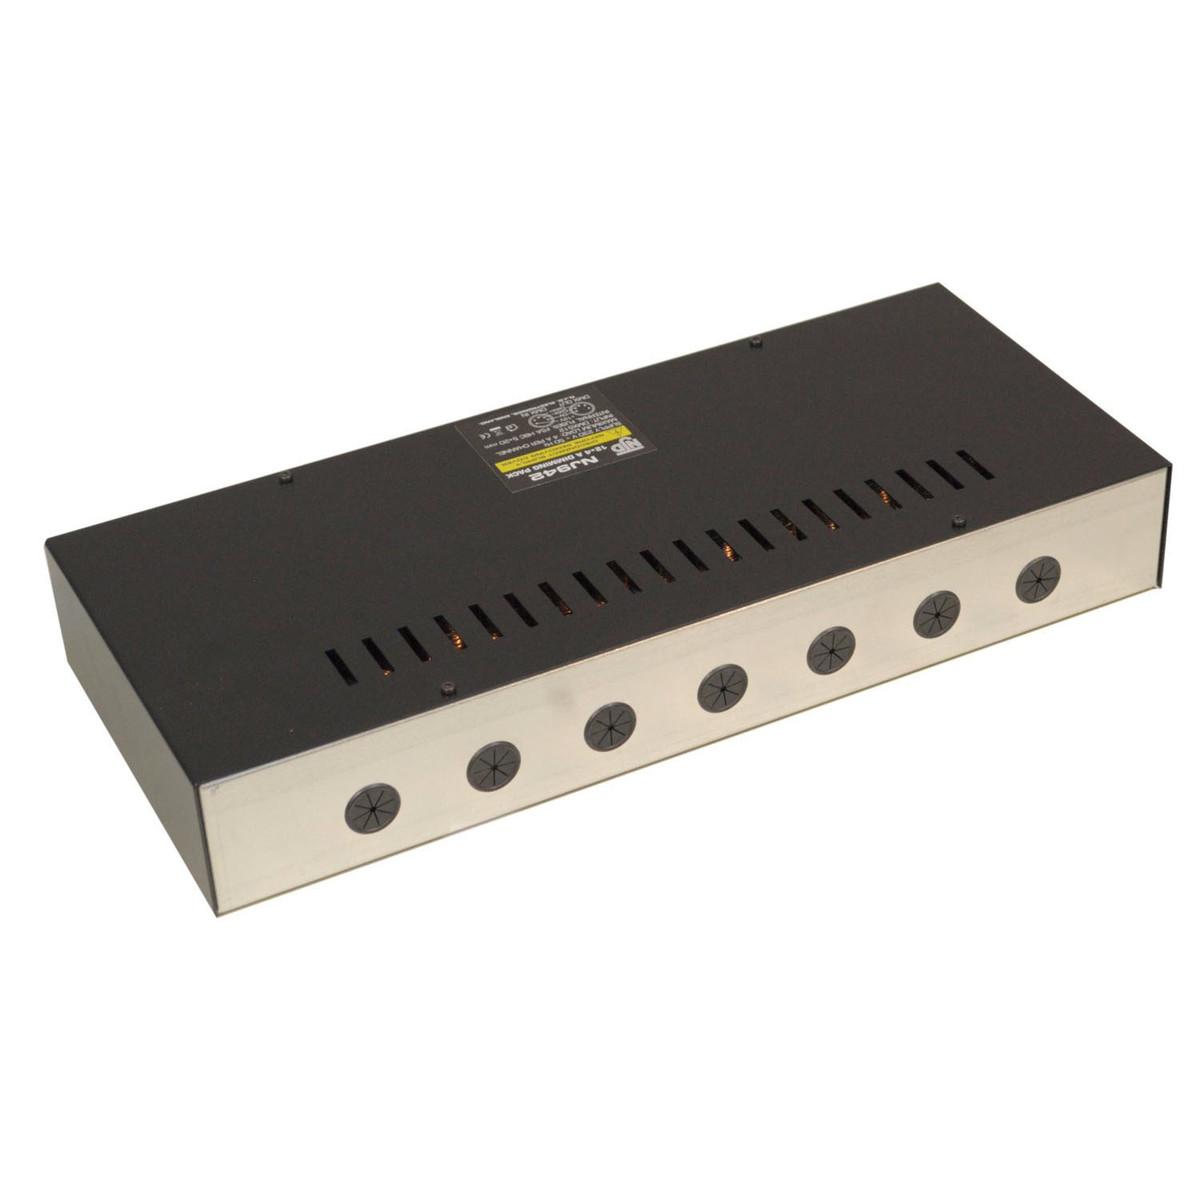 ... Lighting Dimmer Pack. NJ942. Loading zoom  sc 1 st  Gear4music & NJD DPX12/4 12 Channel DMX Lighting Dimmer Pack at Gear4music.com azcodes.com